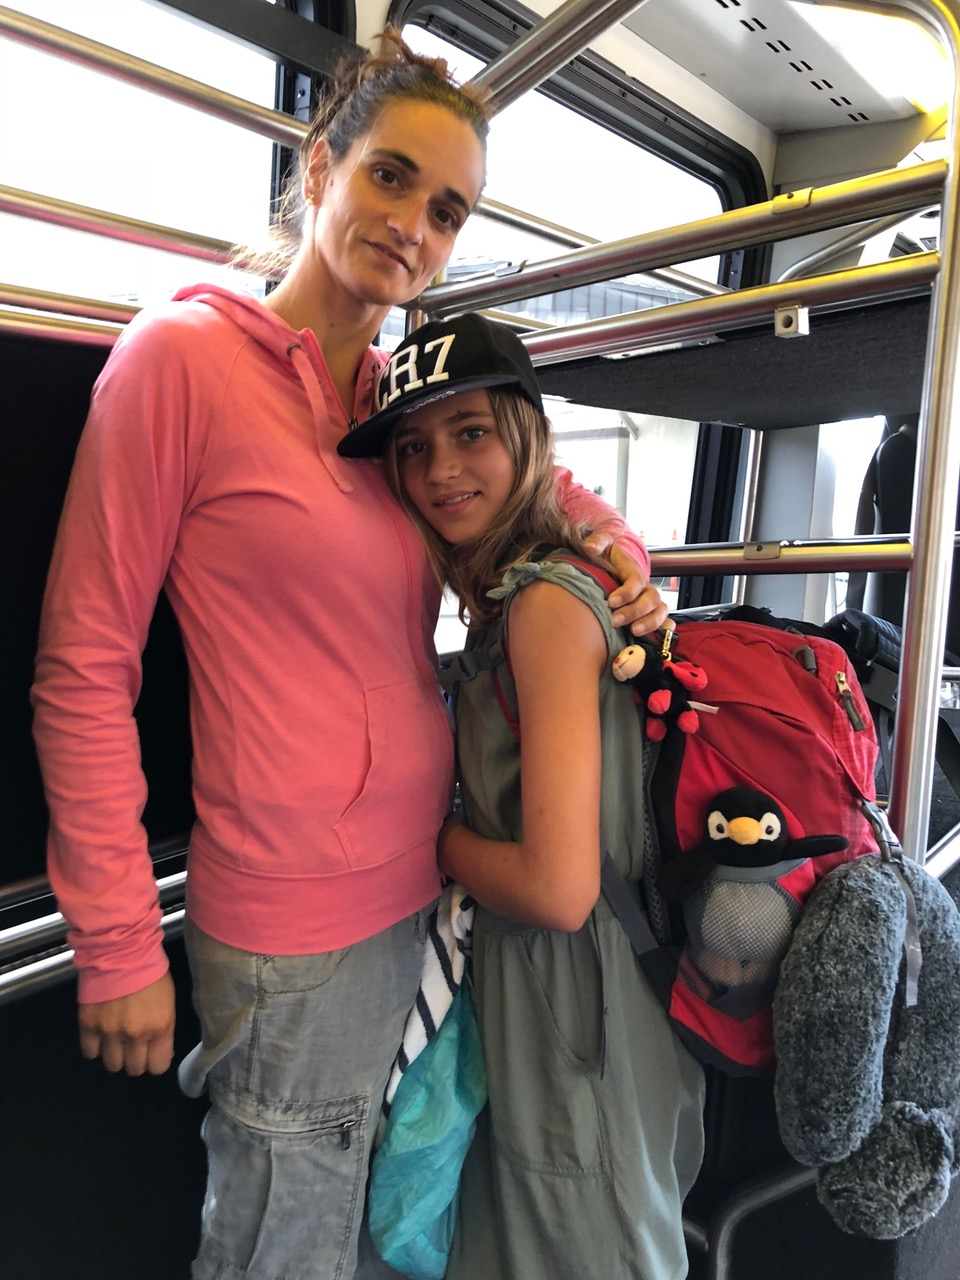 Transfer Bus in Honolulu Hawai'i